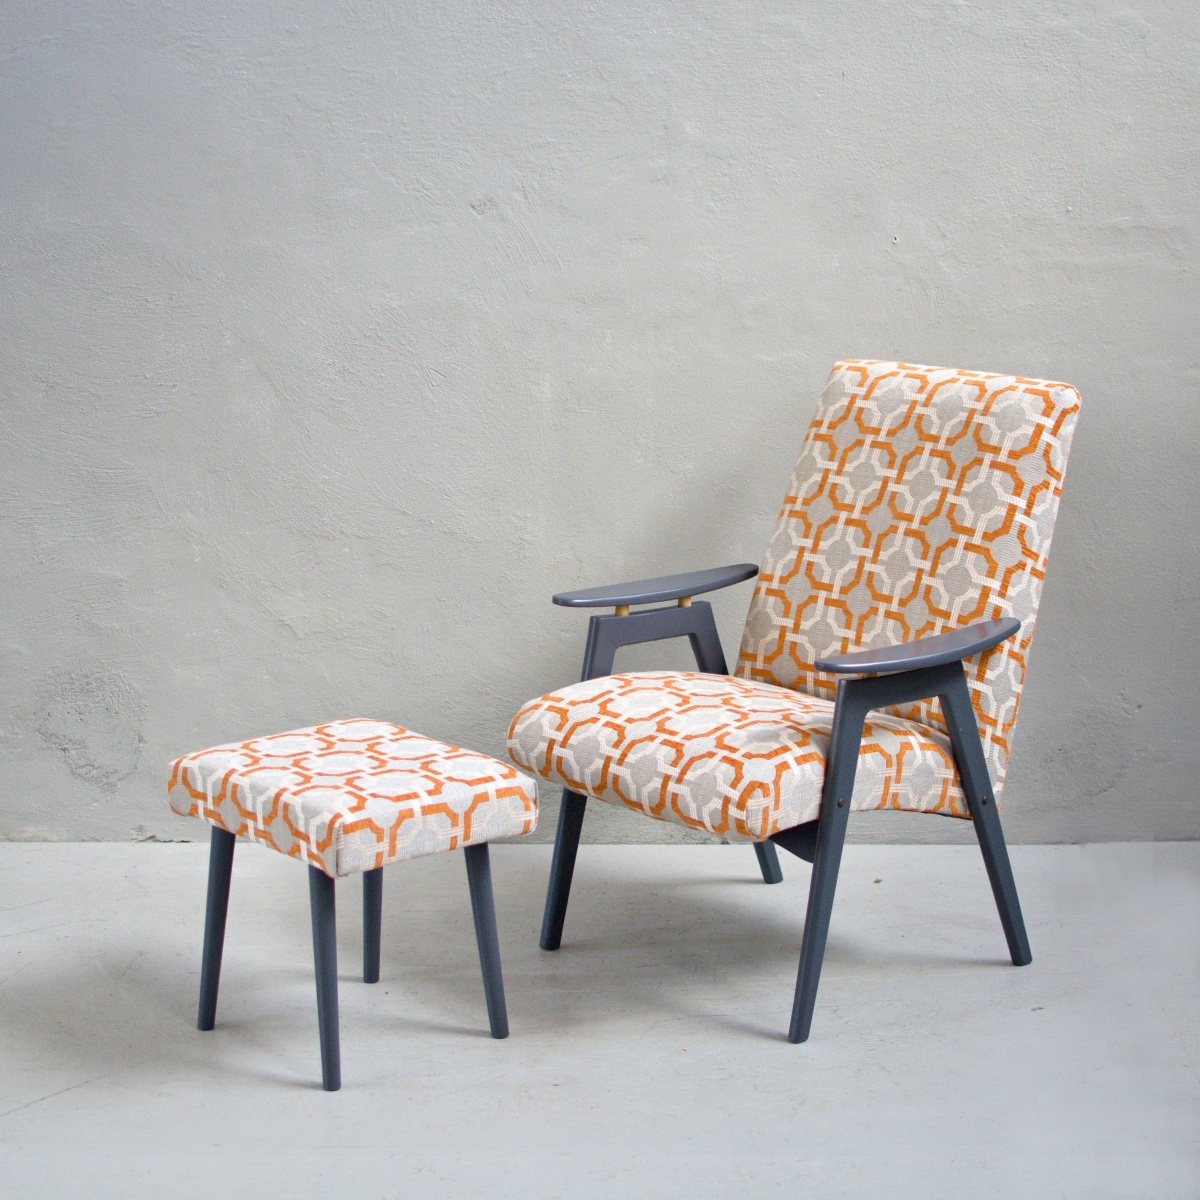 Prodej retro nábytku retro křeslo s podnožkou